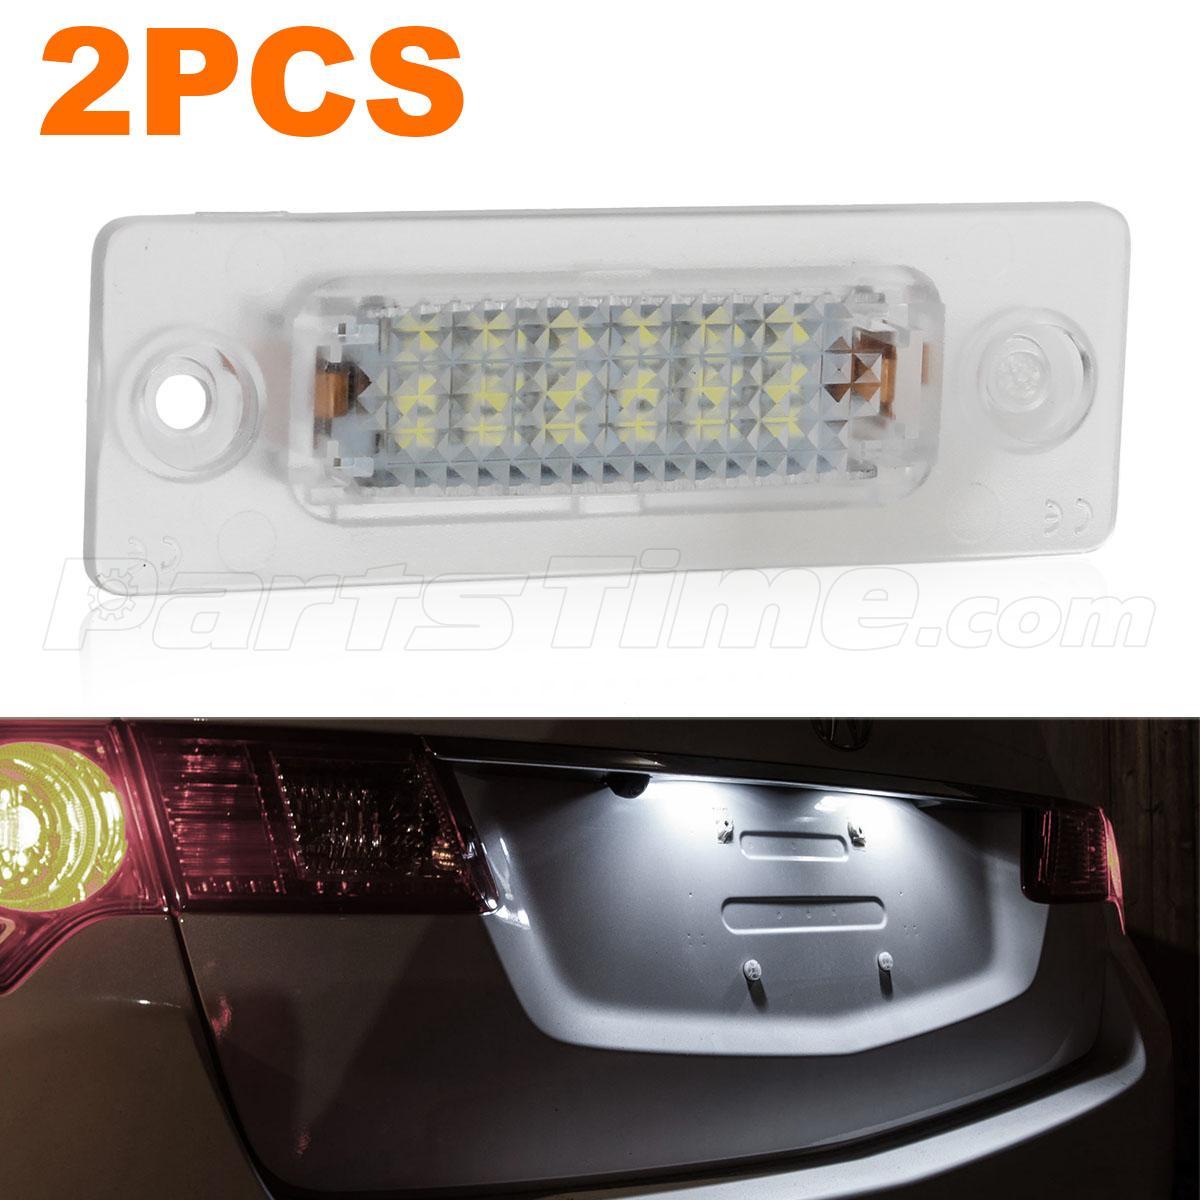 2pcs 6000k White License Plate Lamp Rear Led Lights Set